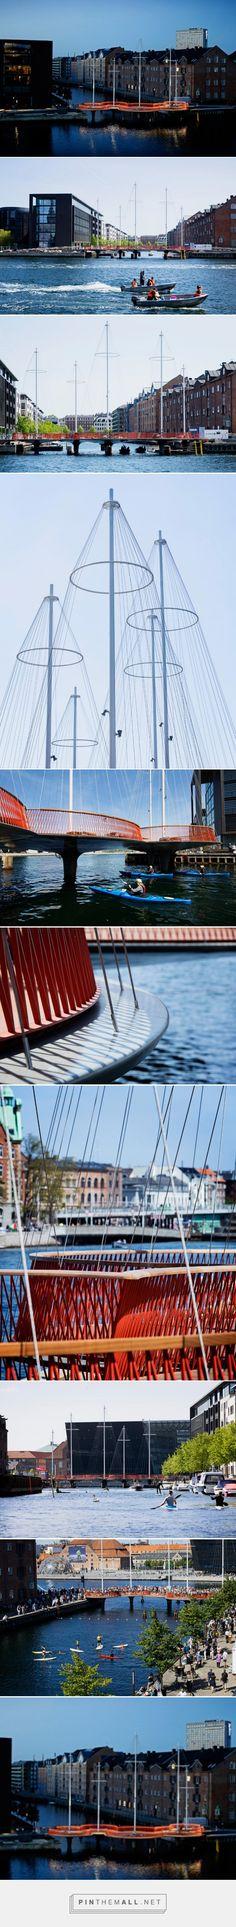 olafur eliasson's cirkelbroen bridge opens in copenhagen - created via http://pinthemall.net